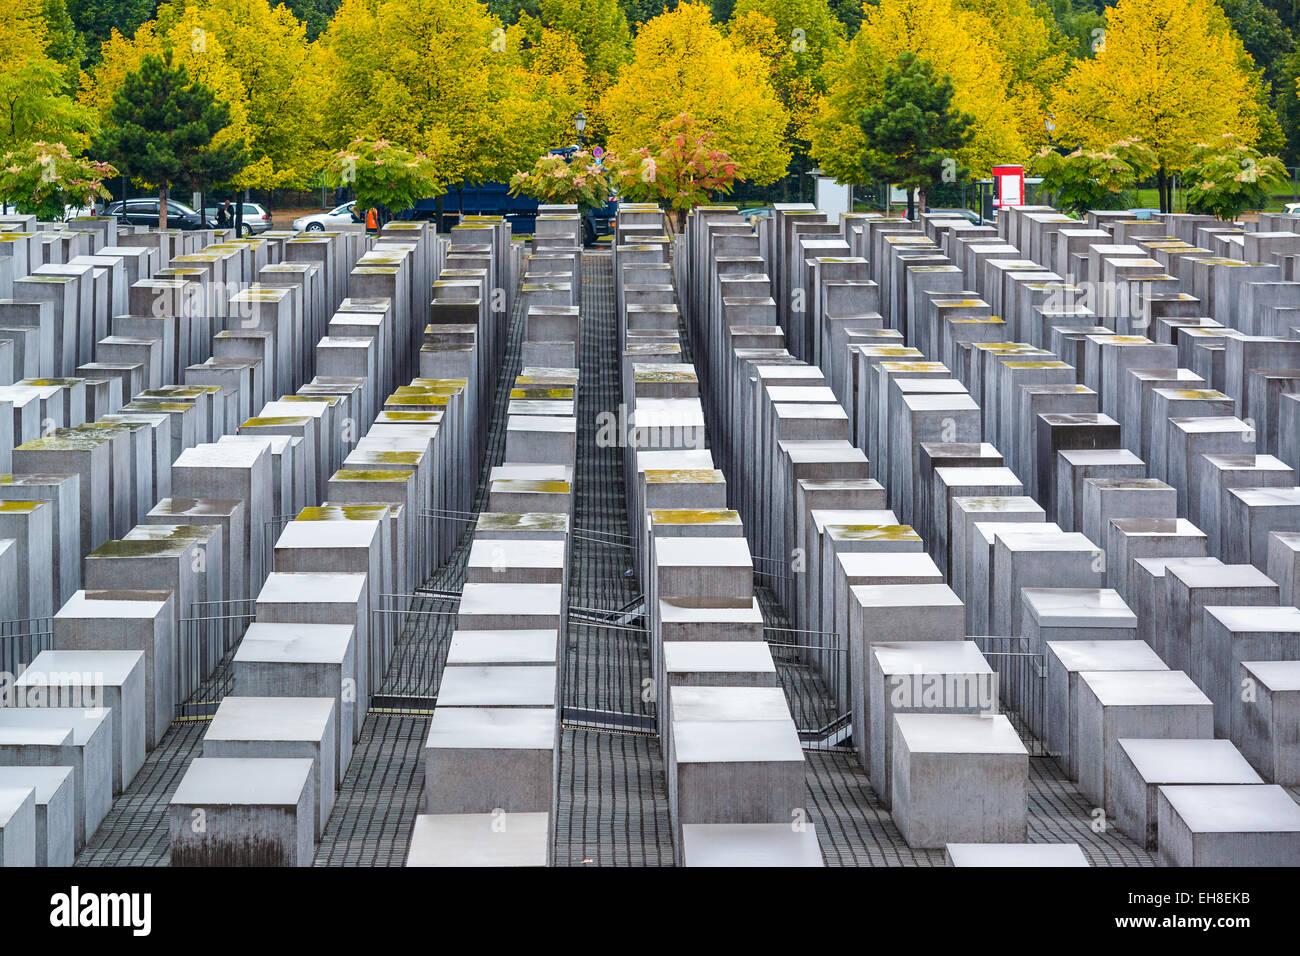 Berlin, Deutschland am Holocaust-Denkmäler. Stockbild